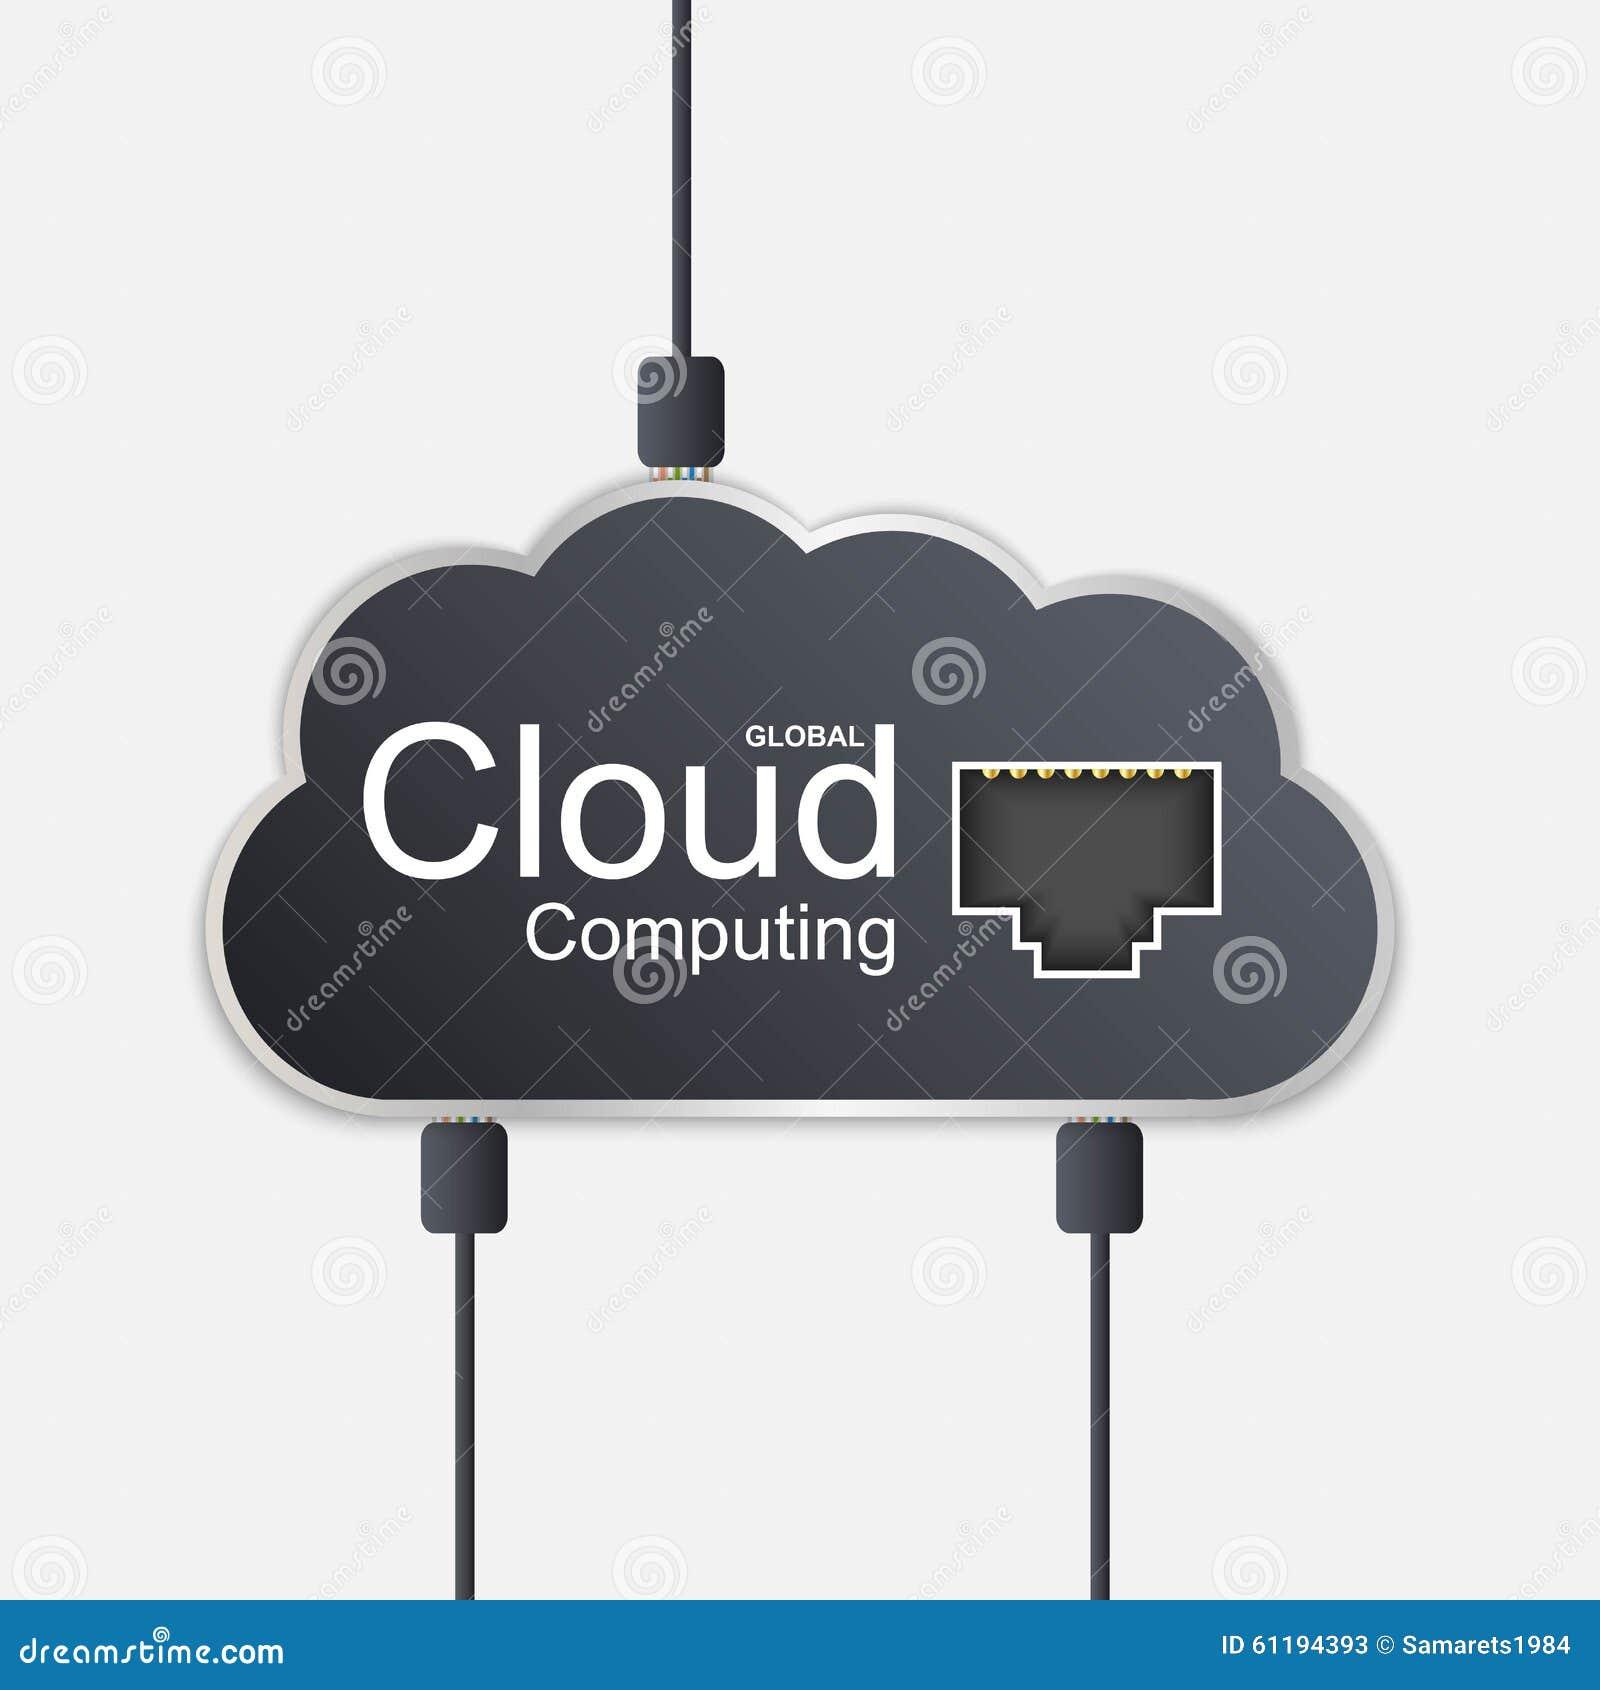 cloud computing concepts technology pdf